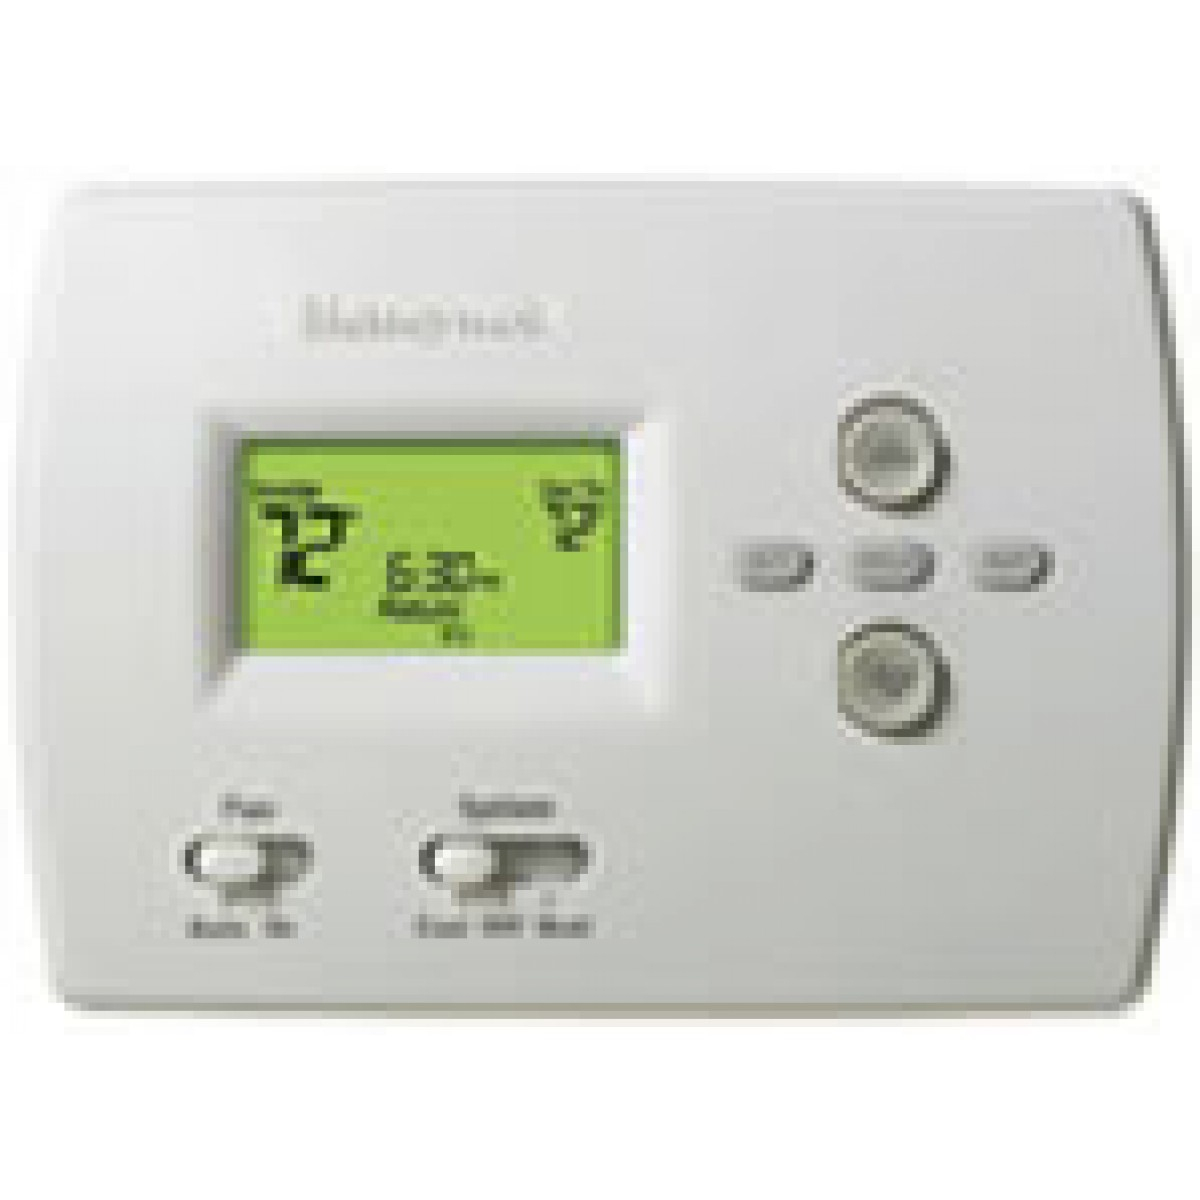 Honeywell 4000 Thermostat Wiring Diagram | Wiring Diagram - Honeywell Thermostat Wiring Diagram 3 Wire